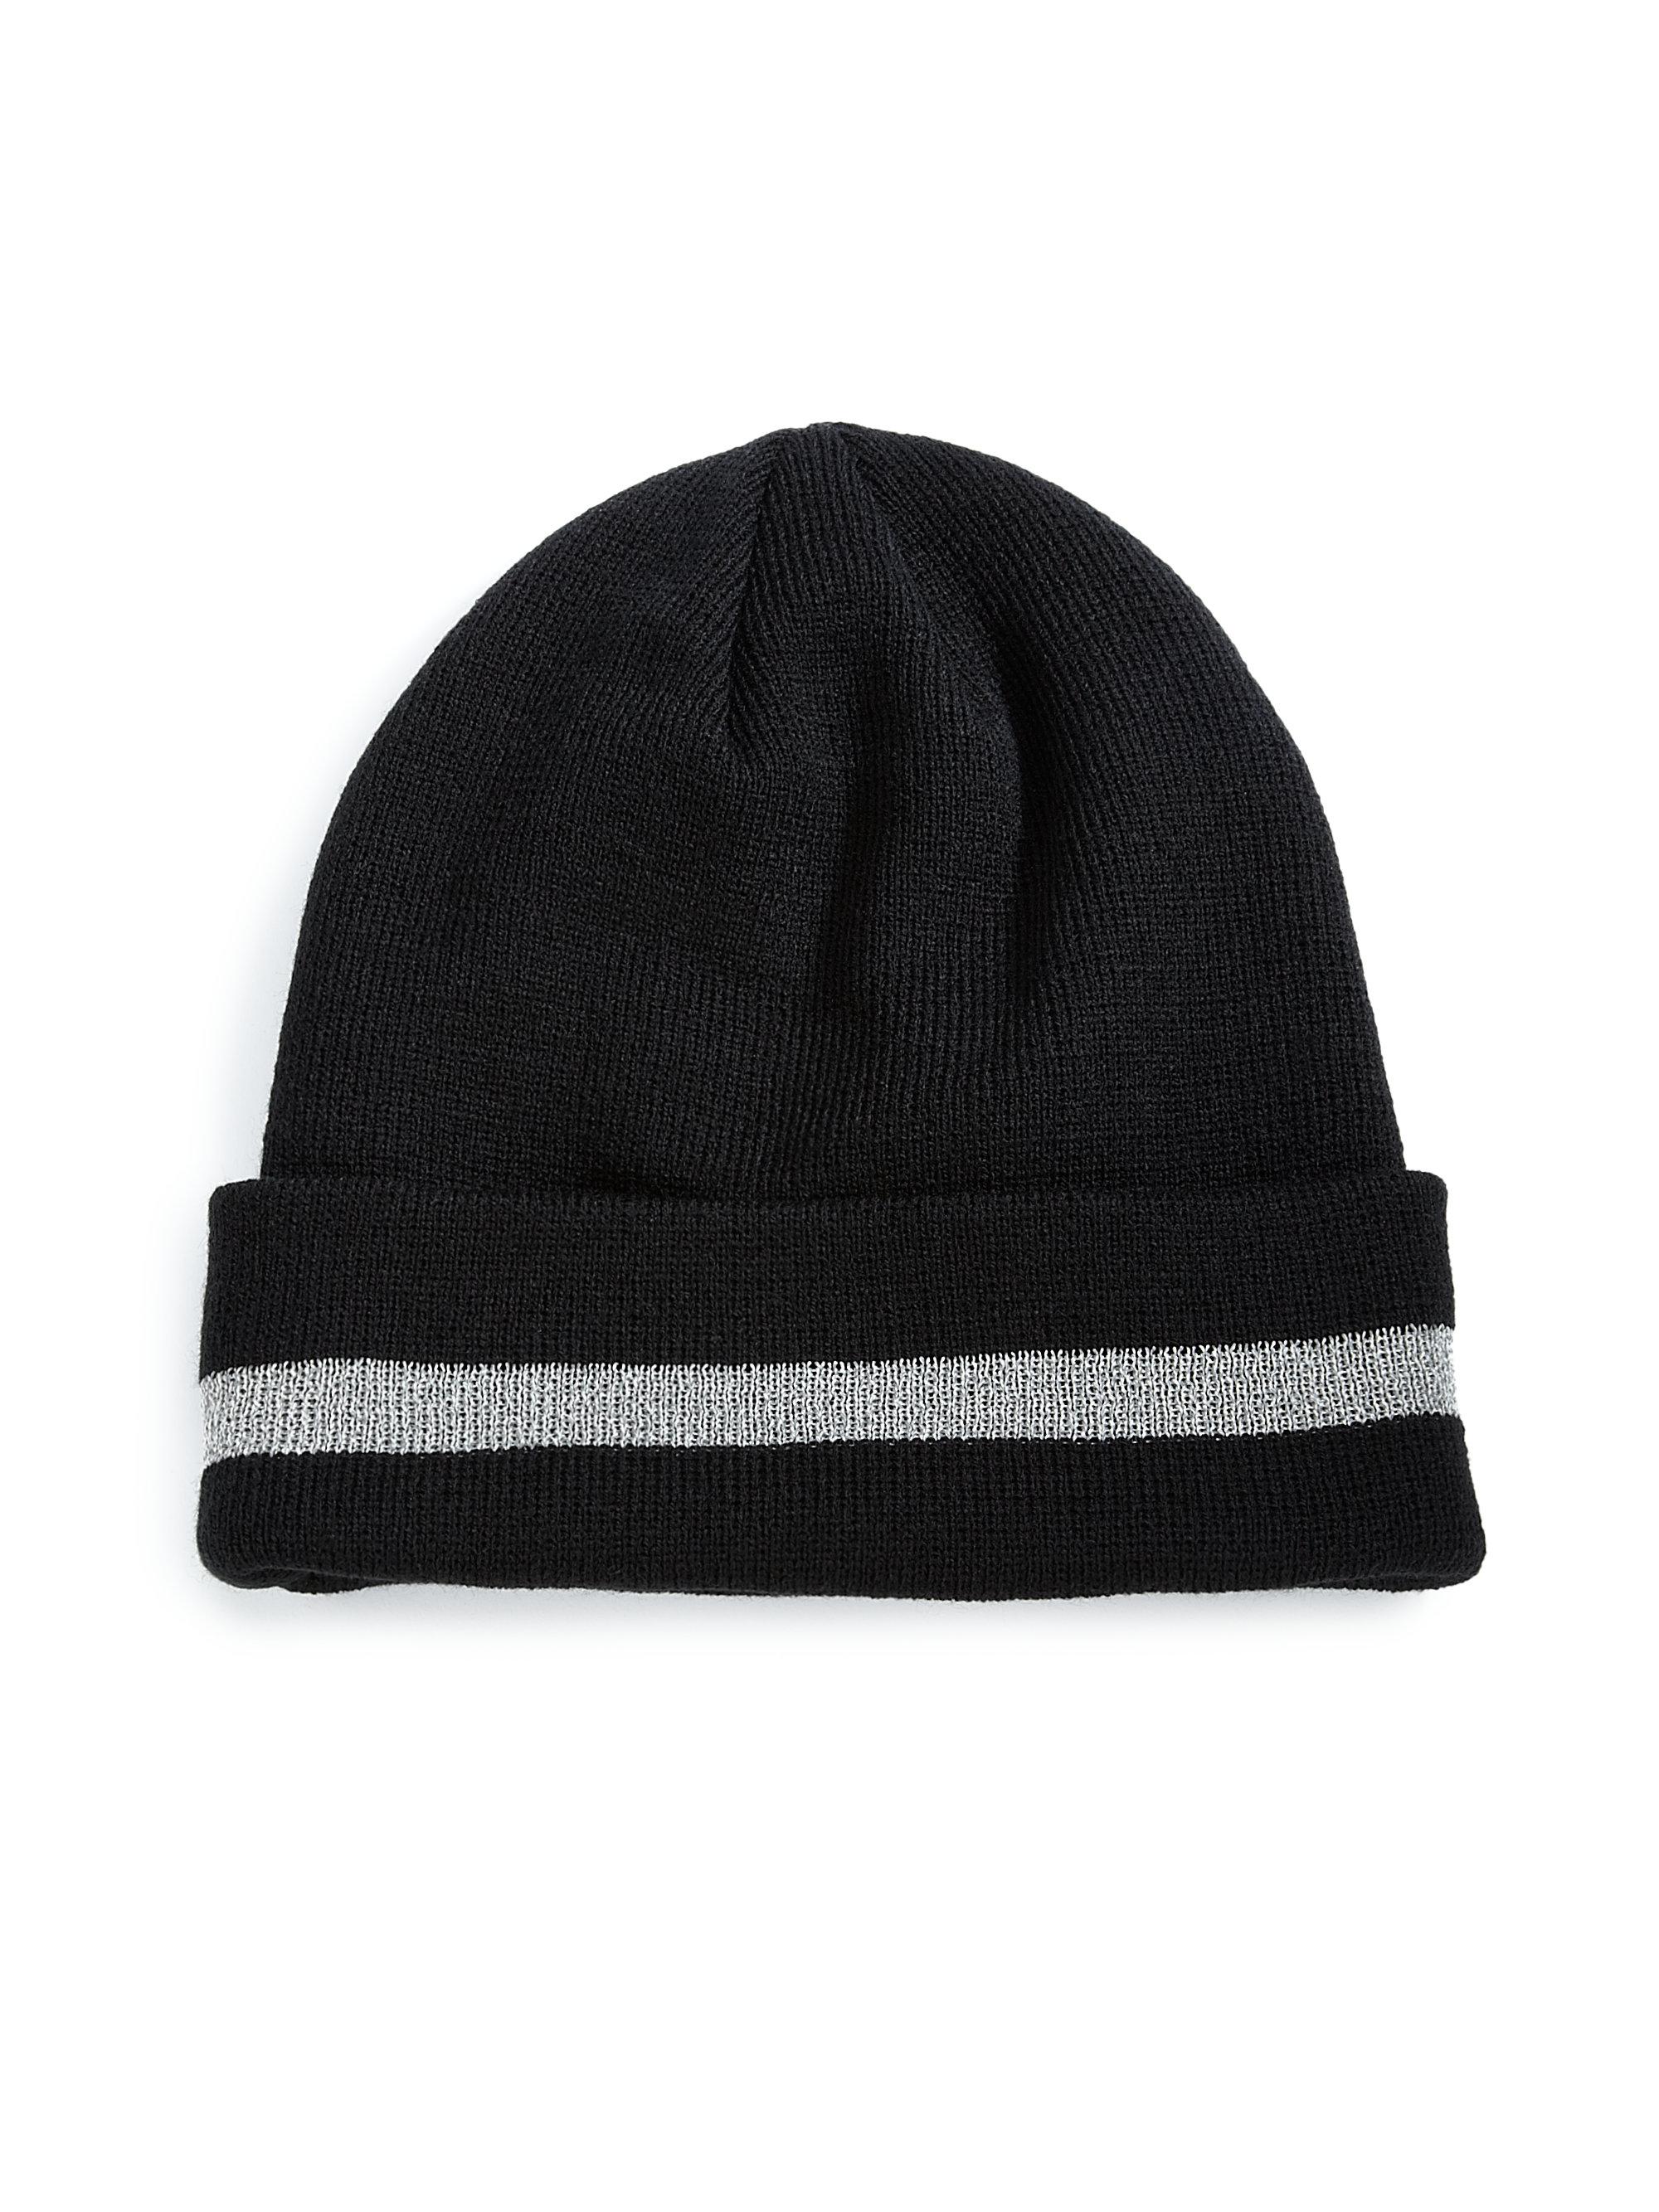 25dfce90 Gents Stripe Reflective Beanie in Black for Men - Lyst